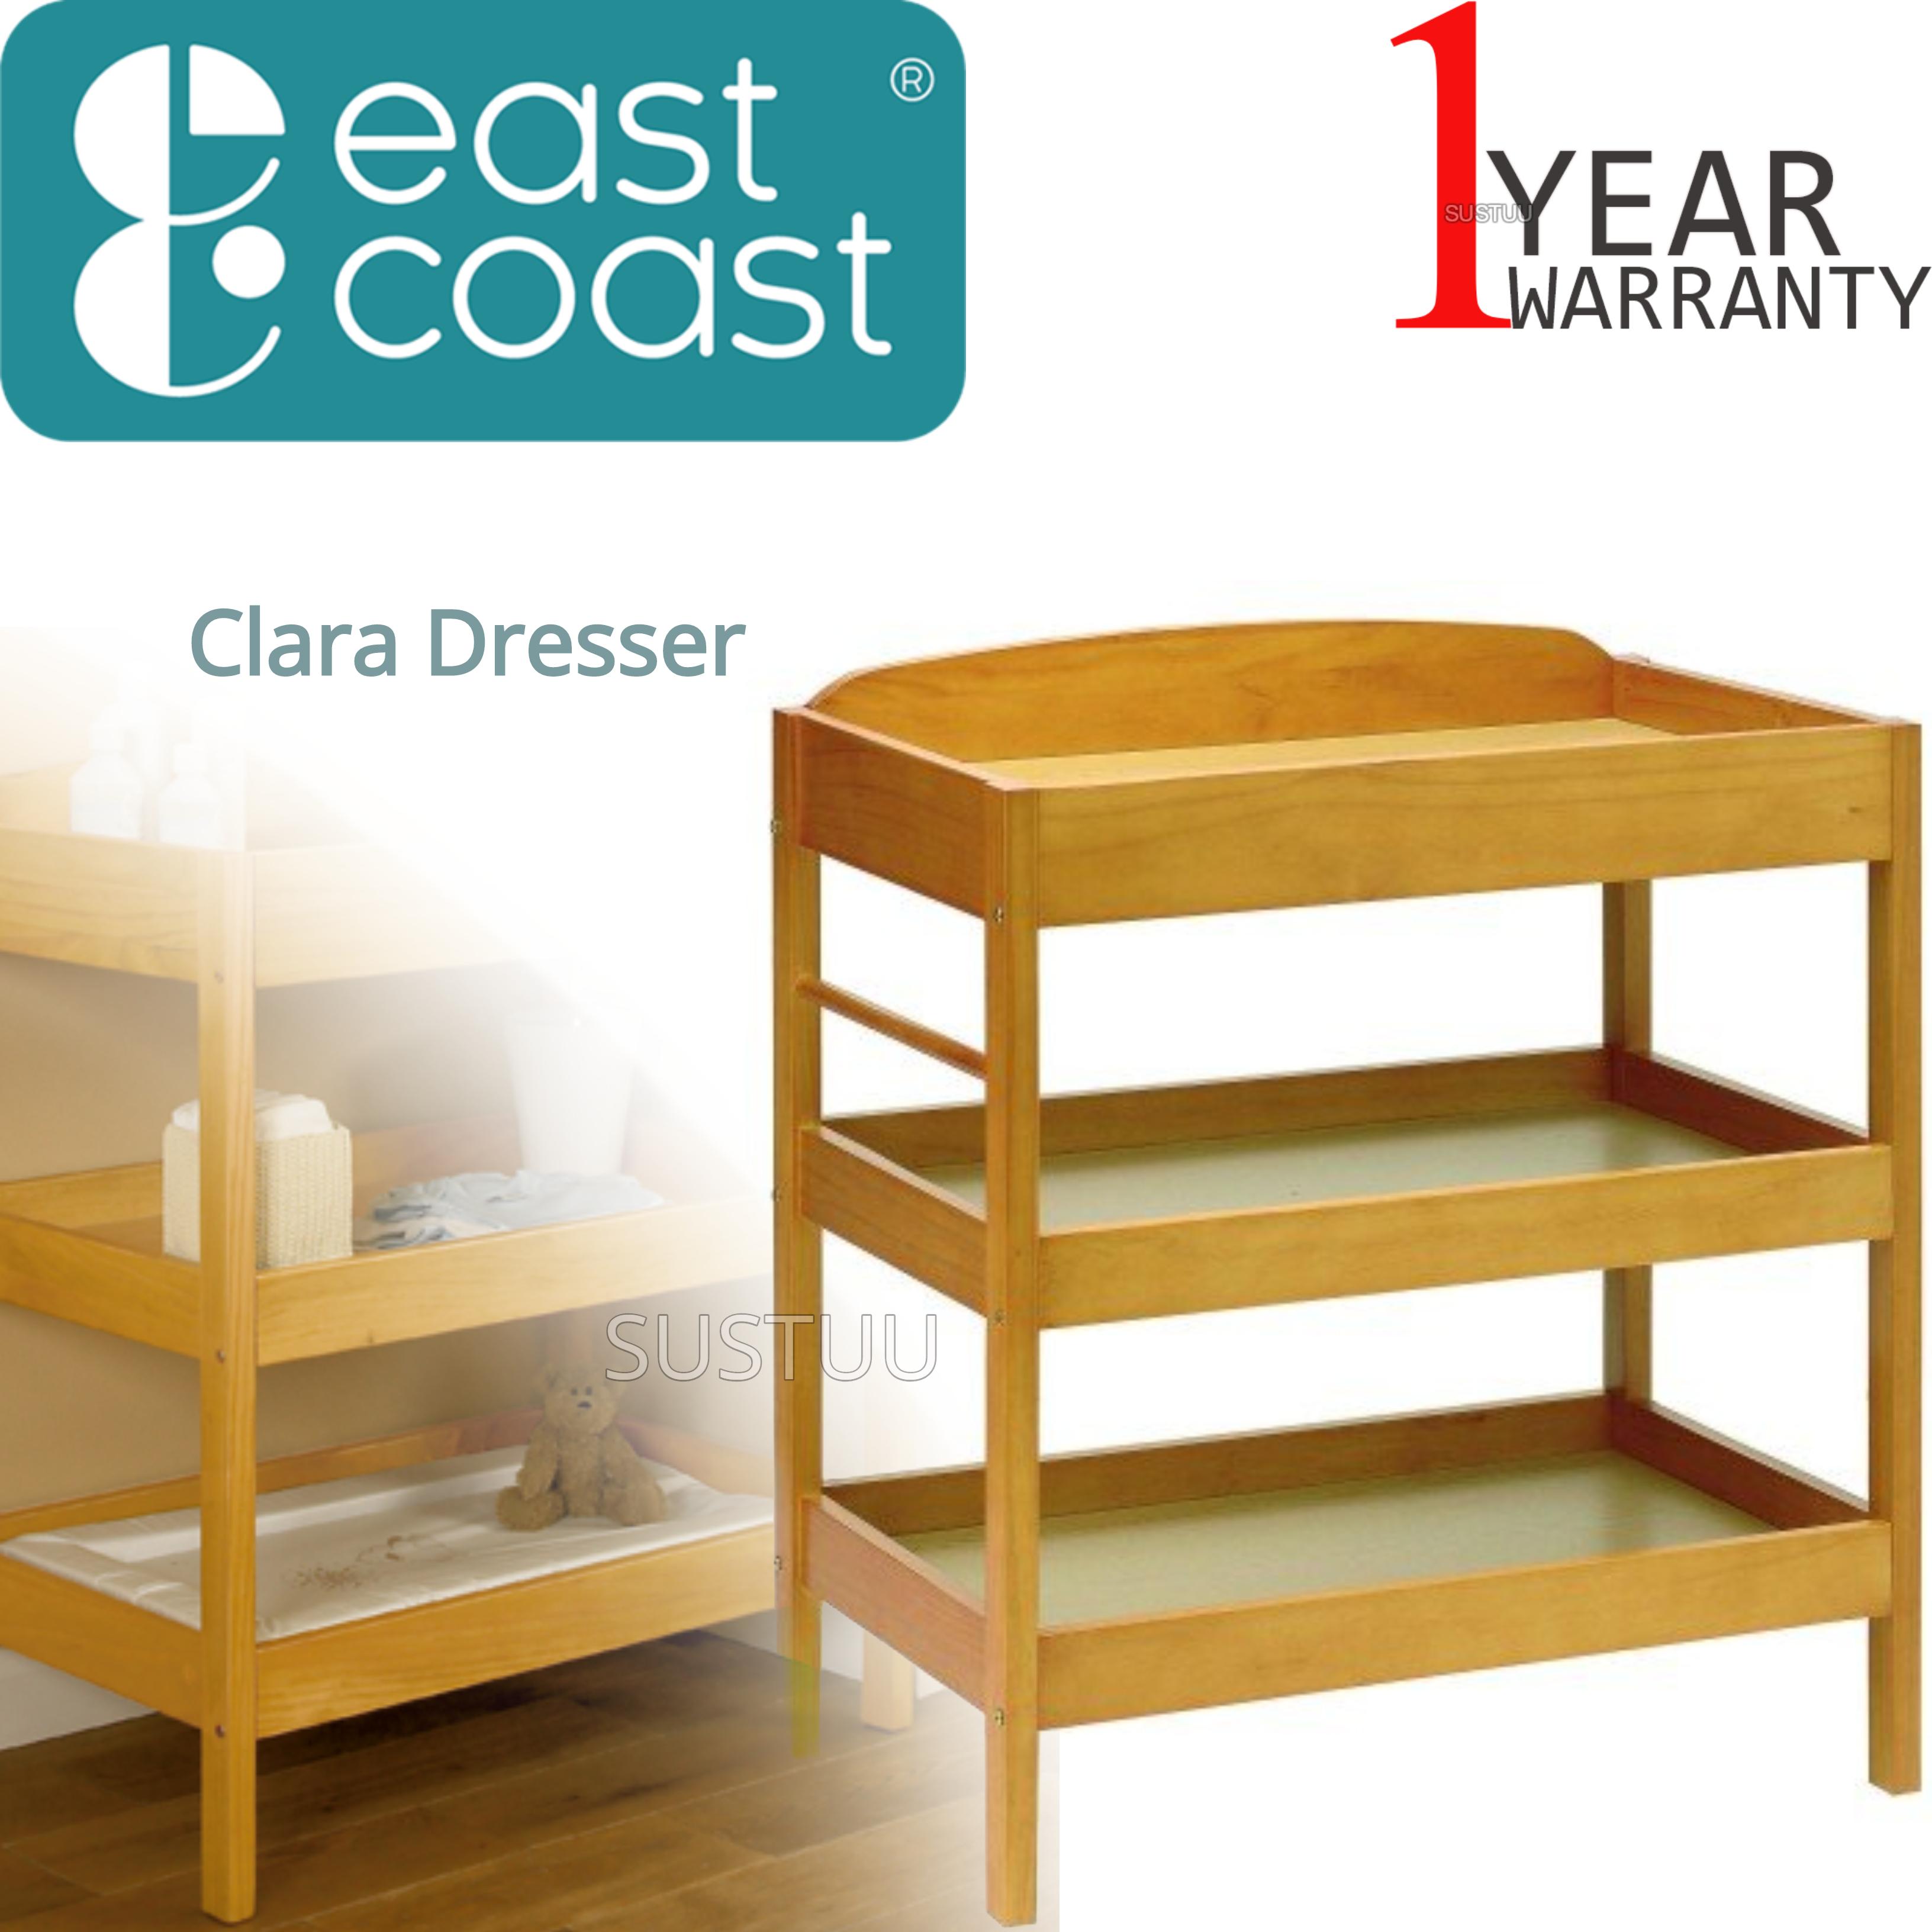 East Coast Clara Dresser   Baby/Kids Storage Shalves/ Table & Towel Rail   Antique